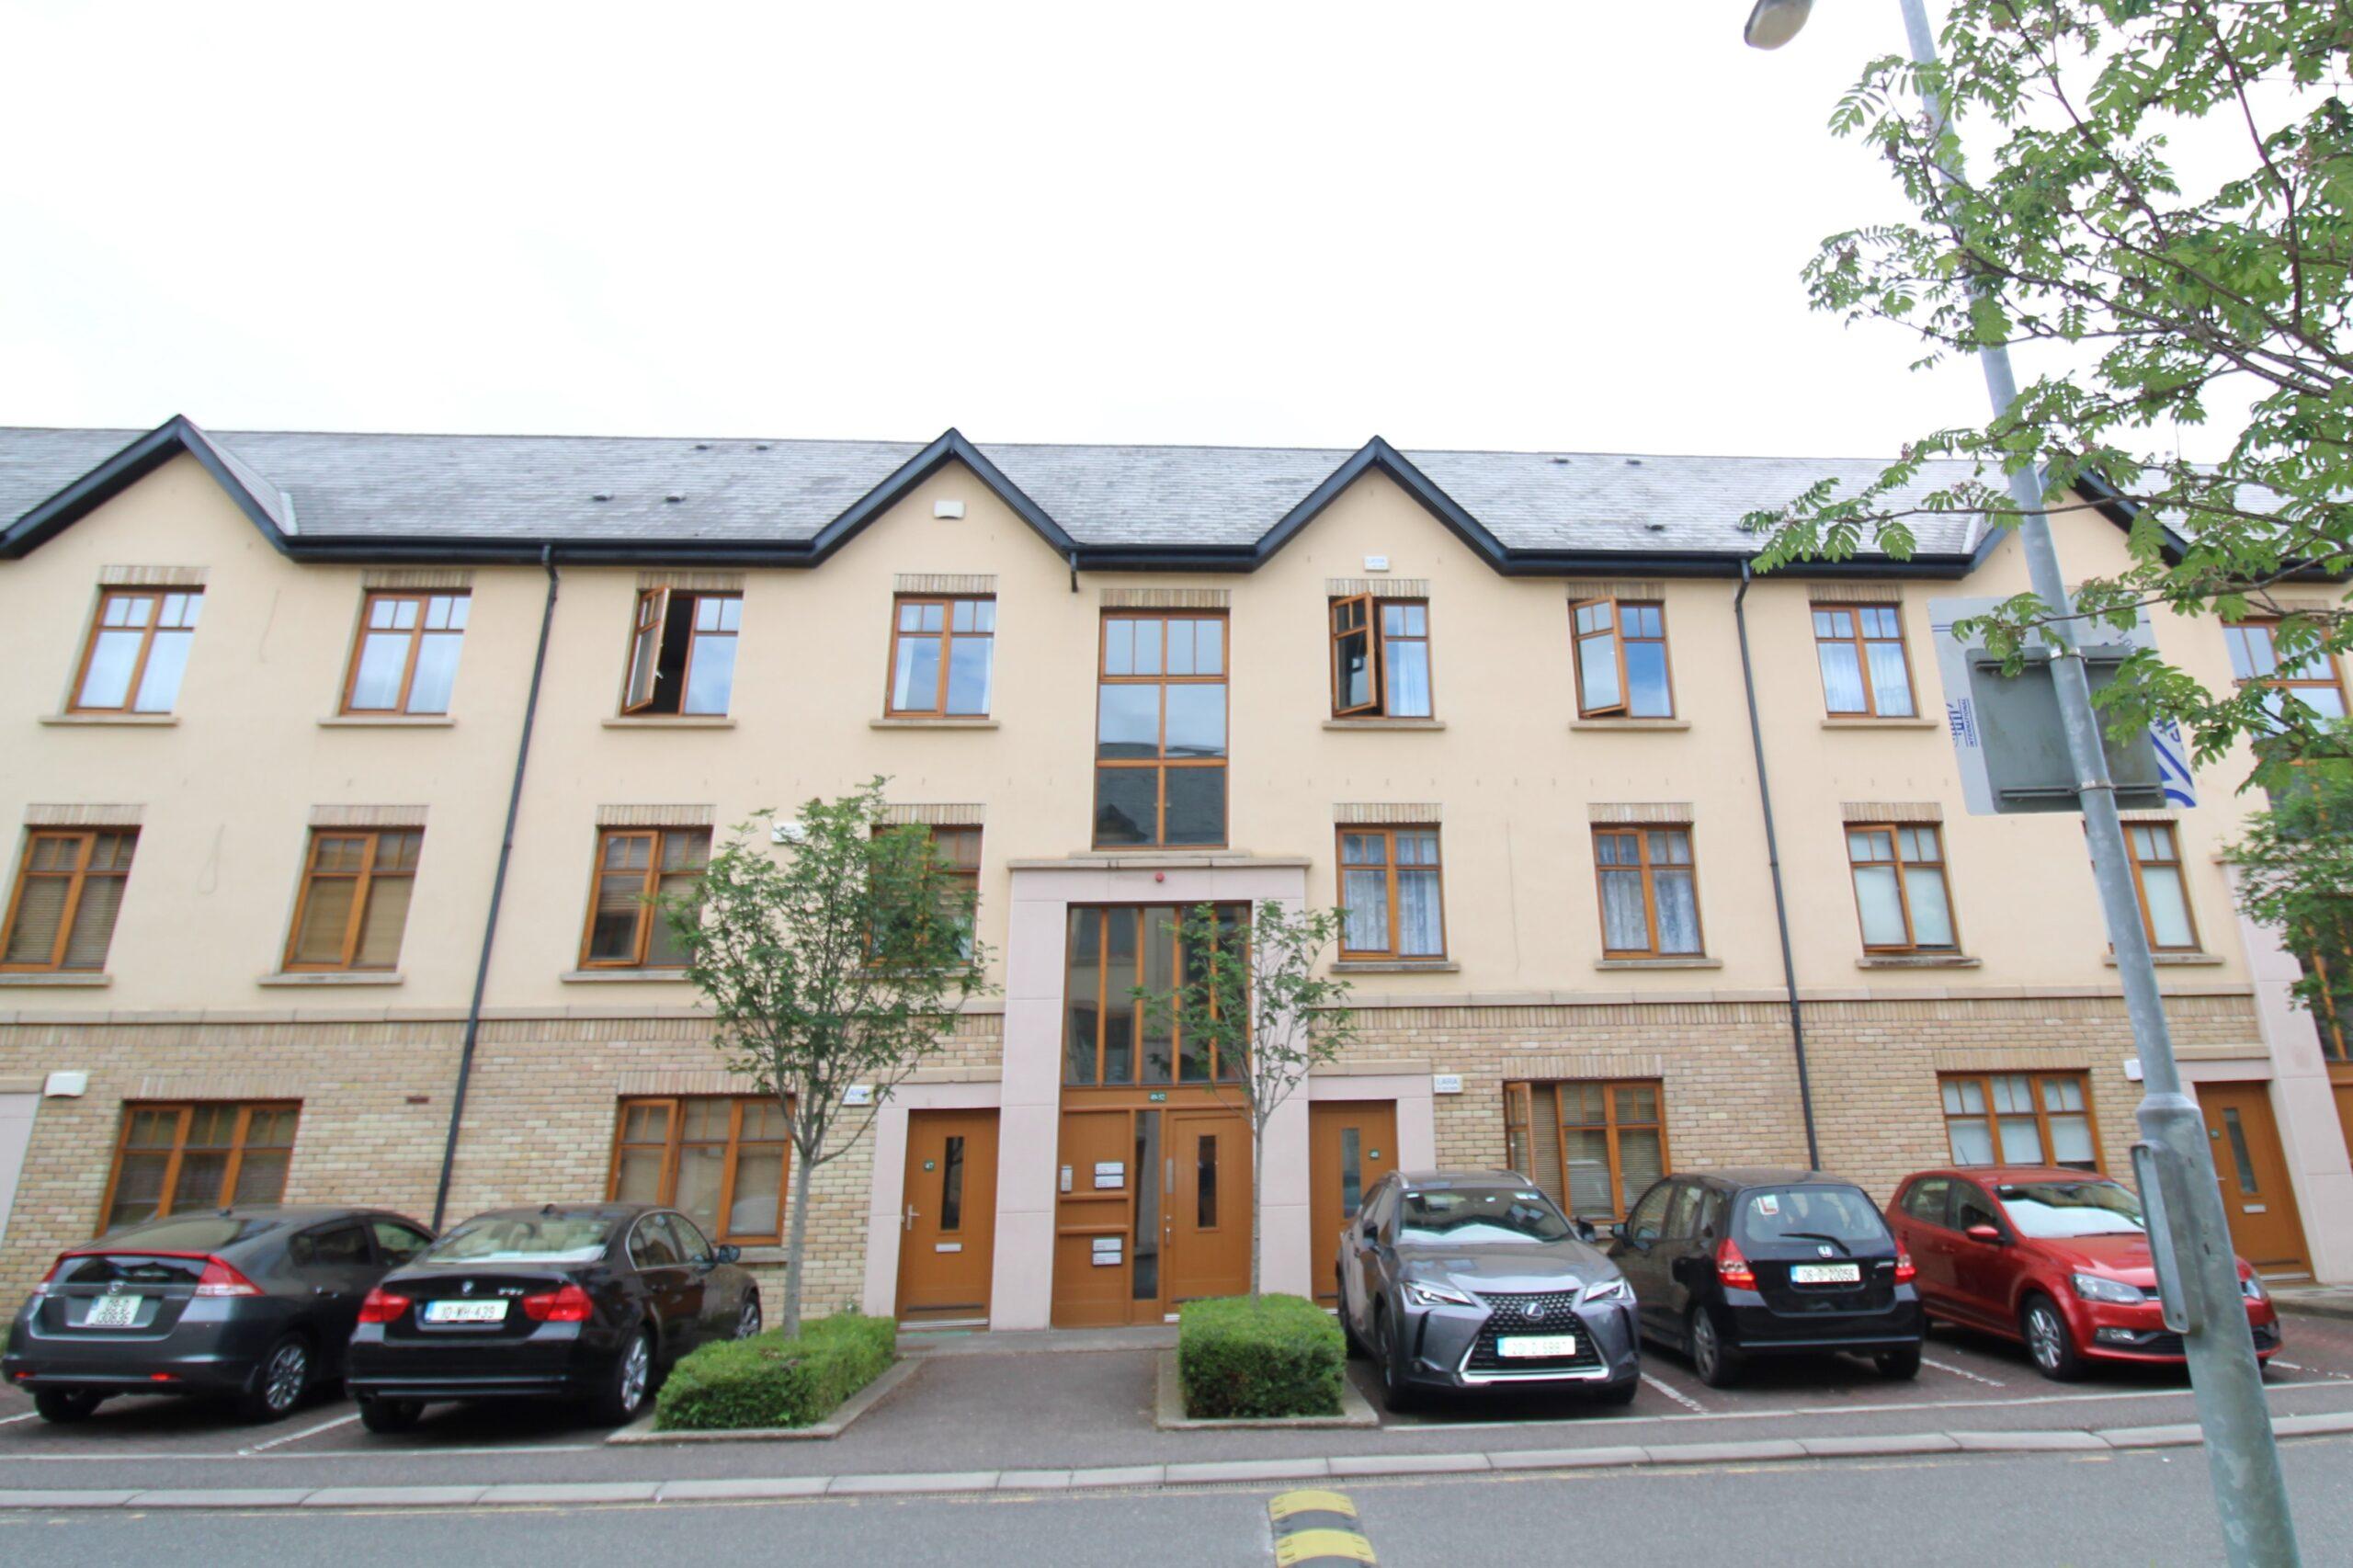 51 Woodbrook Hall, Castleknock, Dublin 15